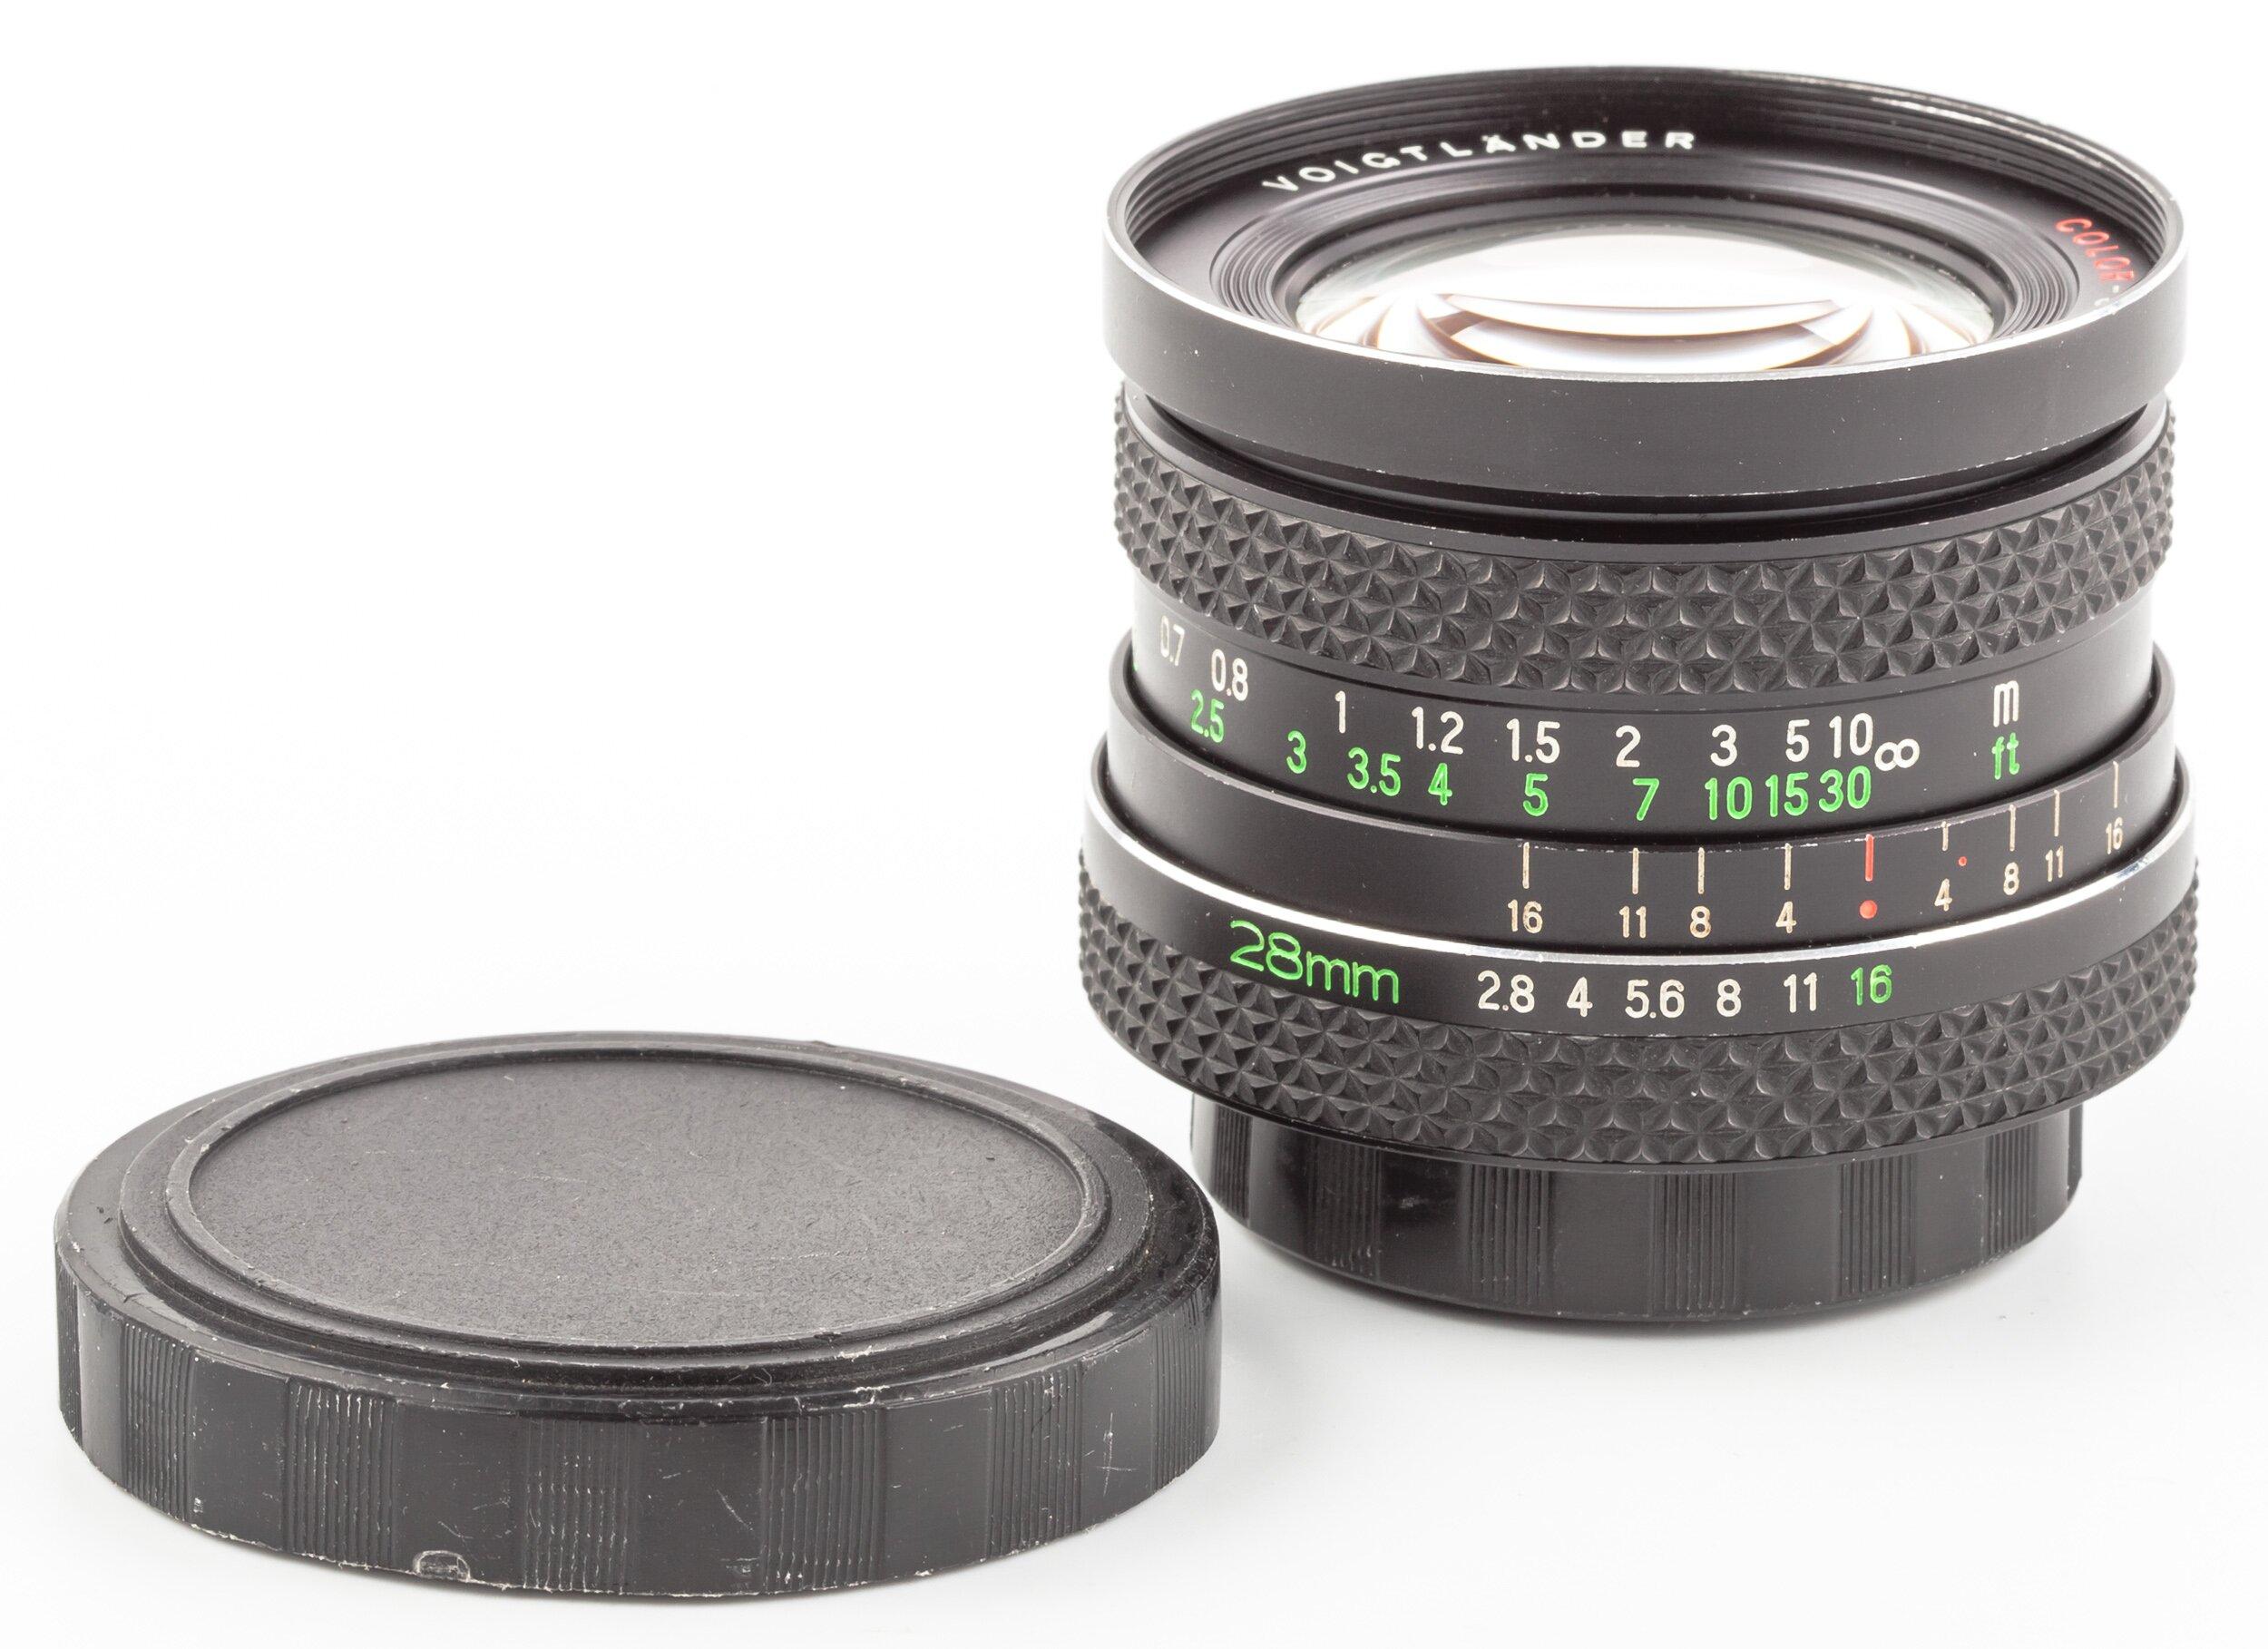 Voigtländer Color Skoparex 28mm F2.8 AR Rollei QBM